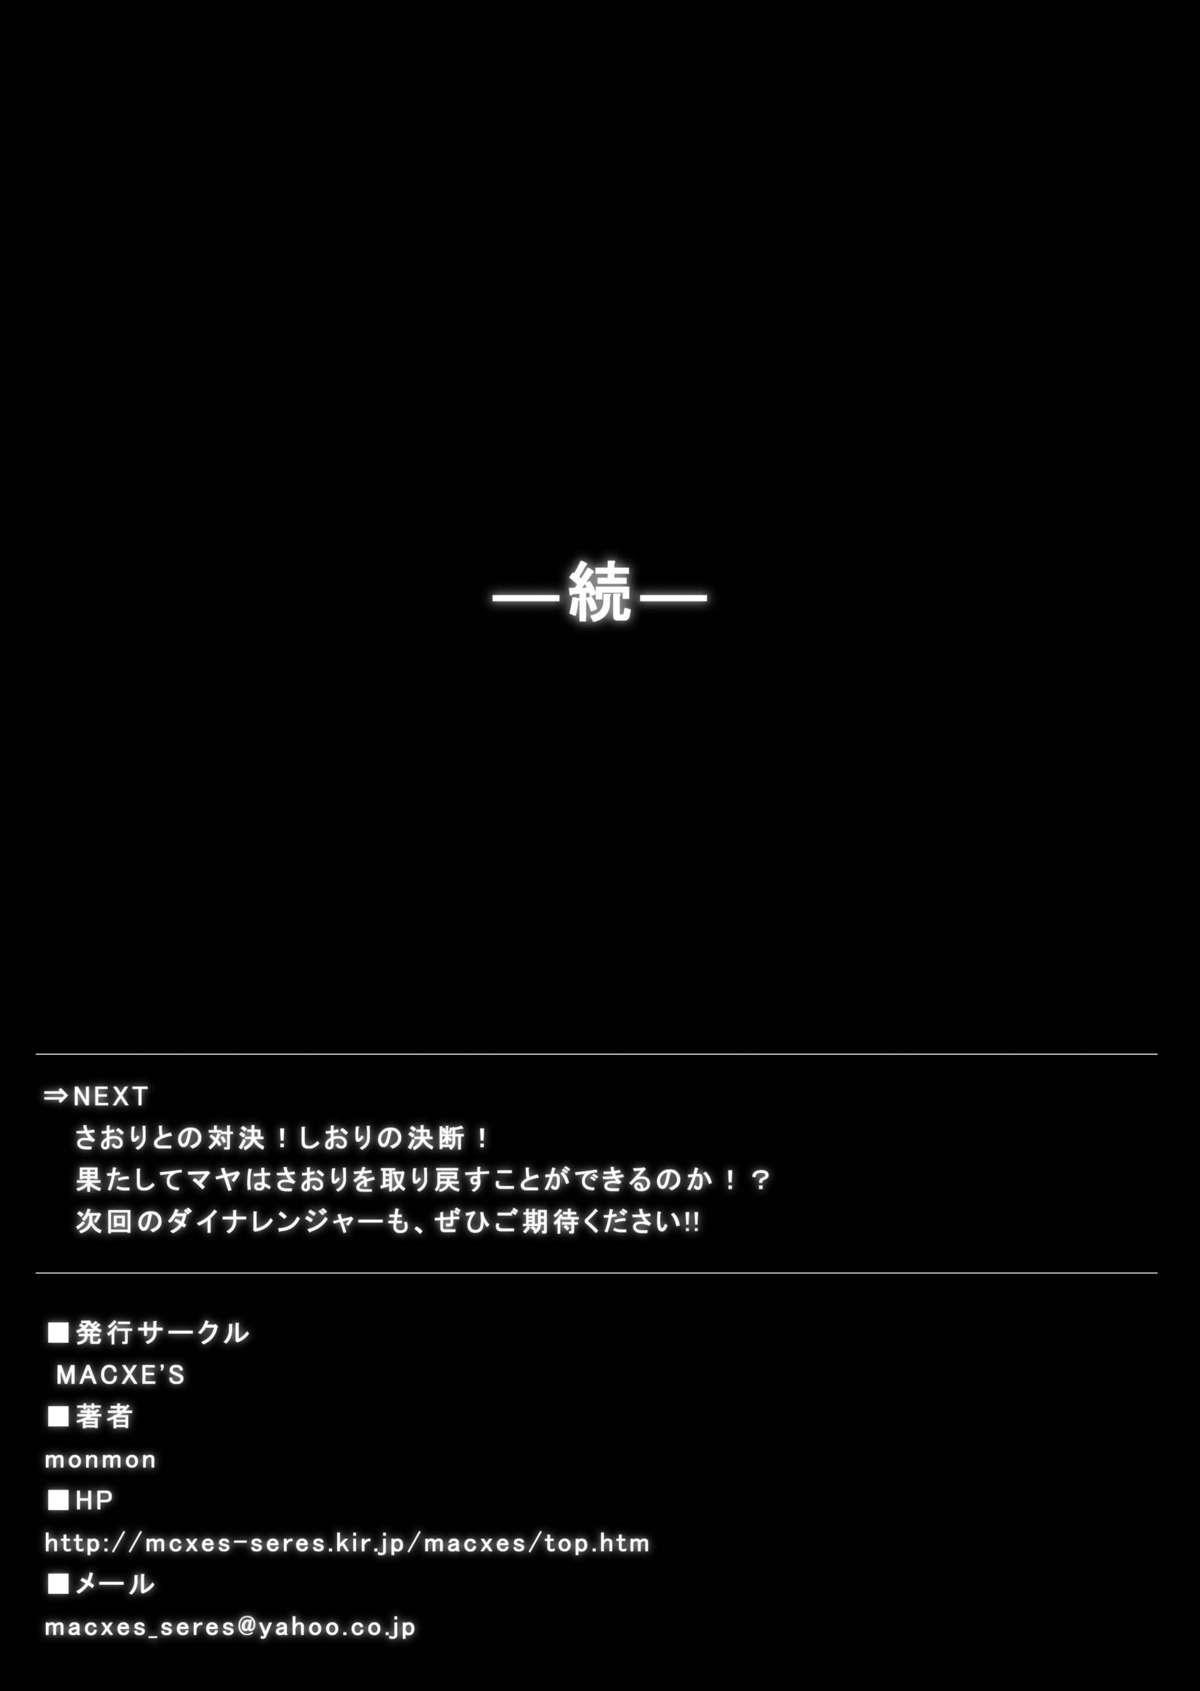 [Macxe's (monmon)] Tokubousentai Dinaranger ~Heroine Kairaku Sennou Keikaku~ Vol.01/02/03 (Renkaban) [Digital] 151